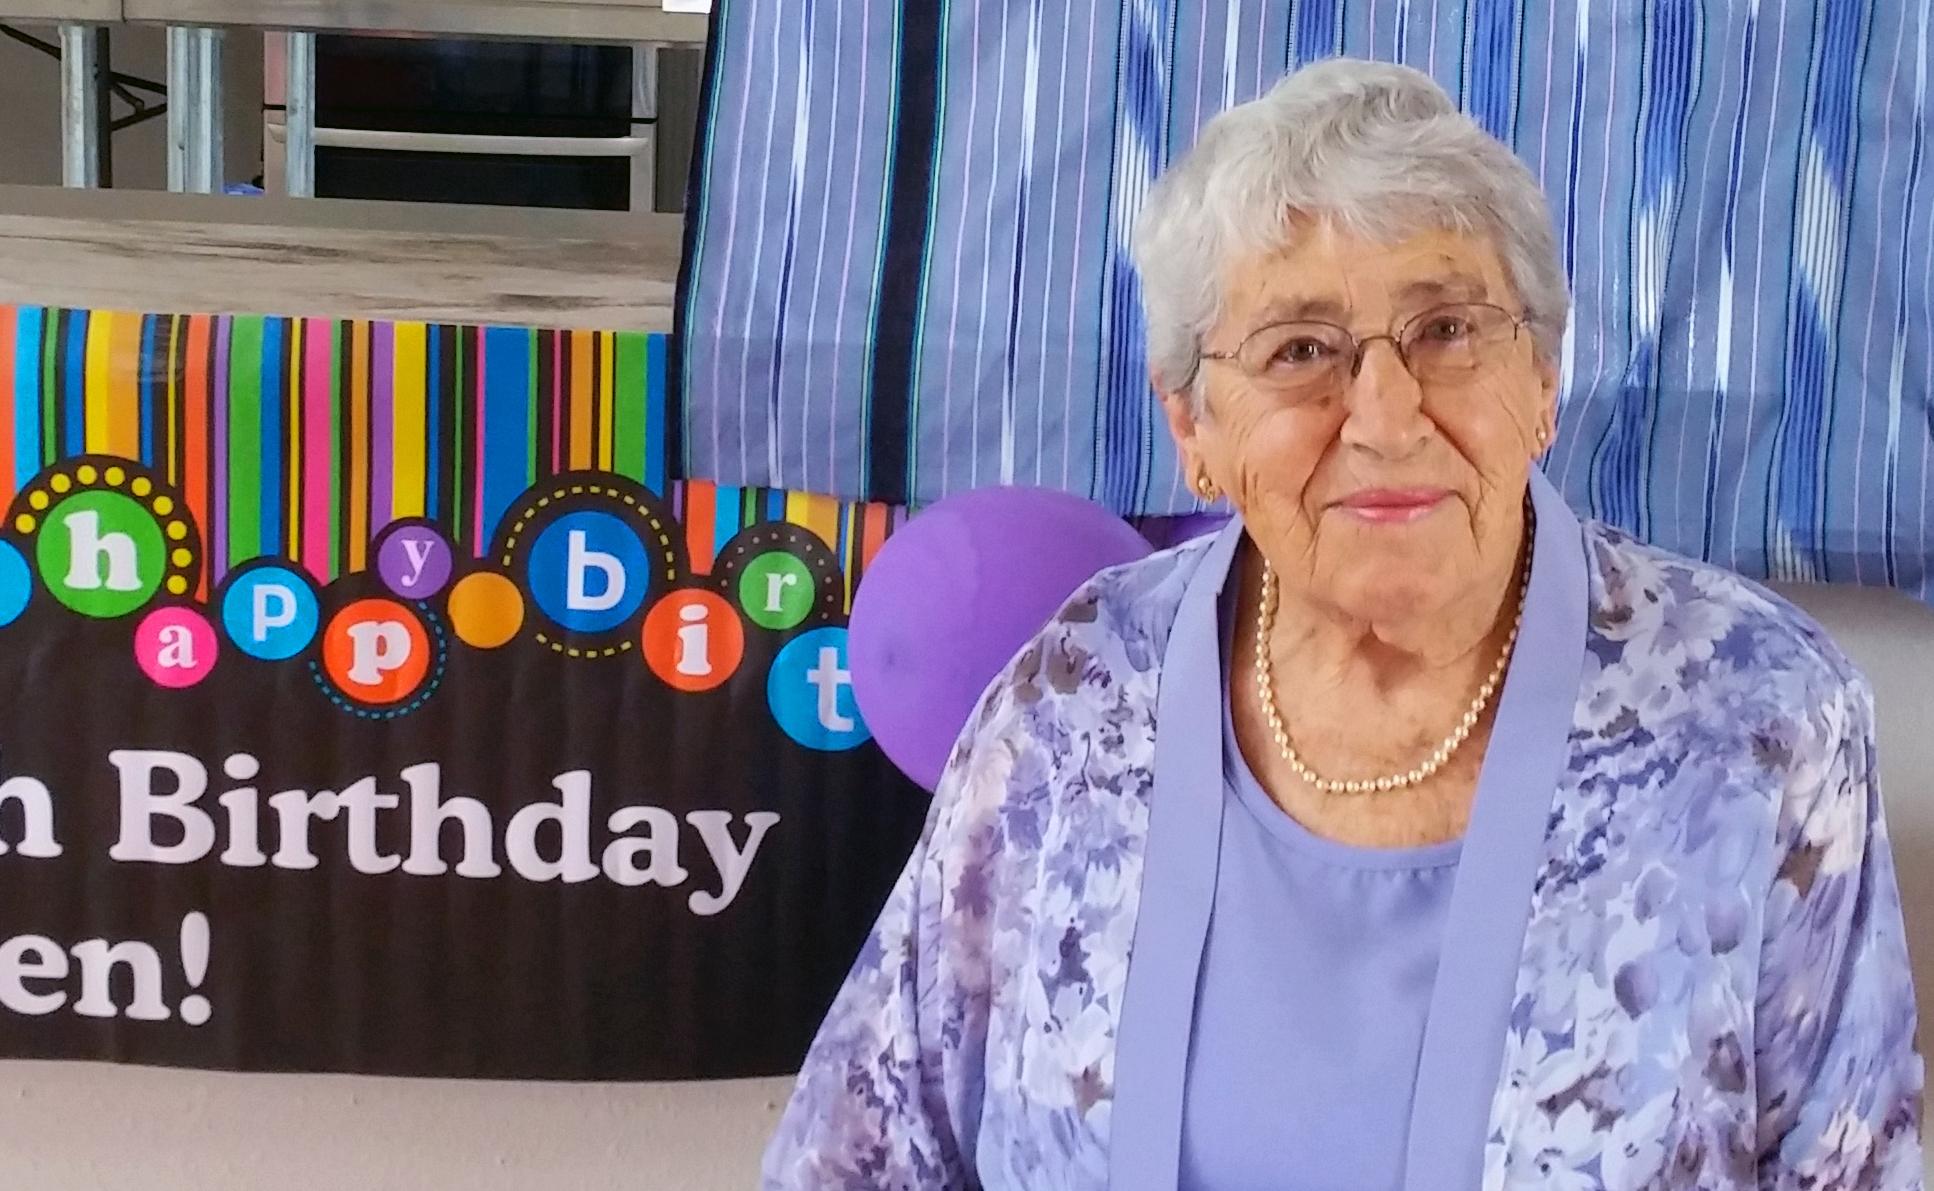 Helen Dawley celebrates her 90th birthday at Rhems United Methodist Church. In 2004, she persuaded the congregation's United Methodist Women to help sponsor refugees. Photo courtesy of Rhems United Methodist Church